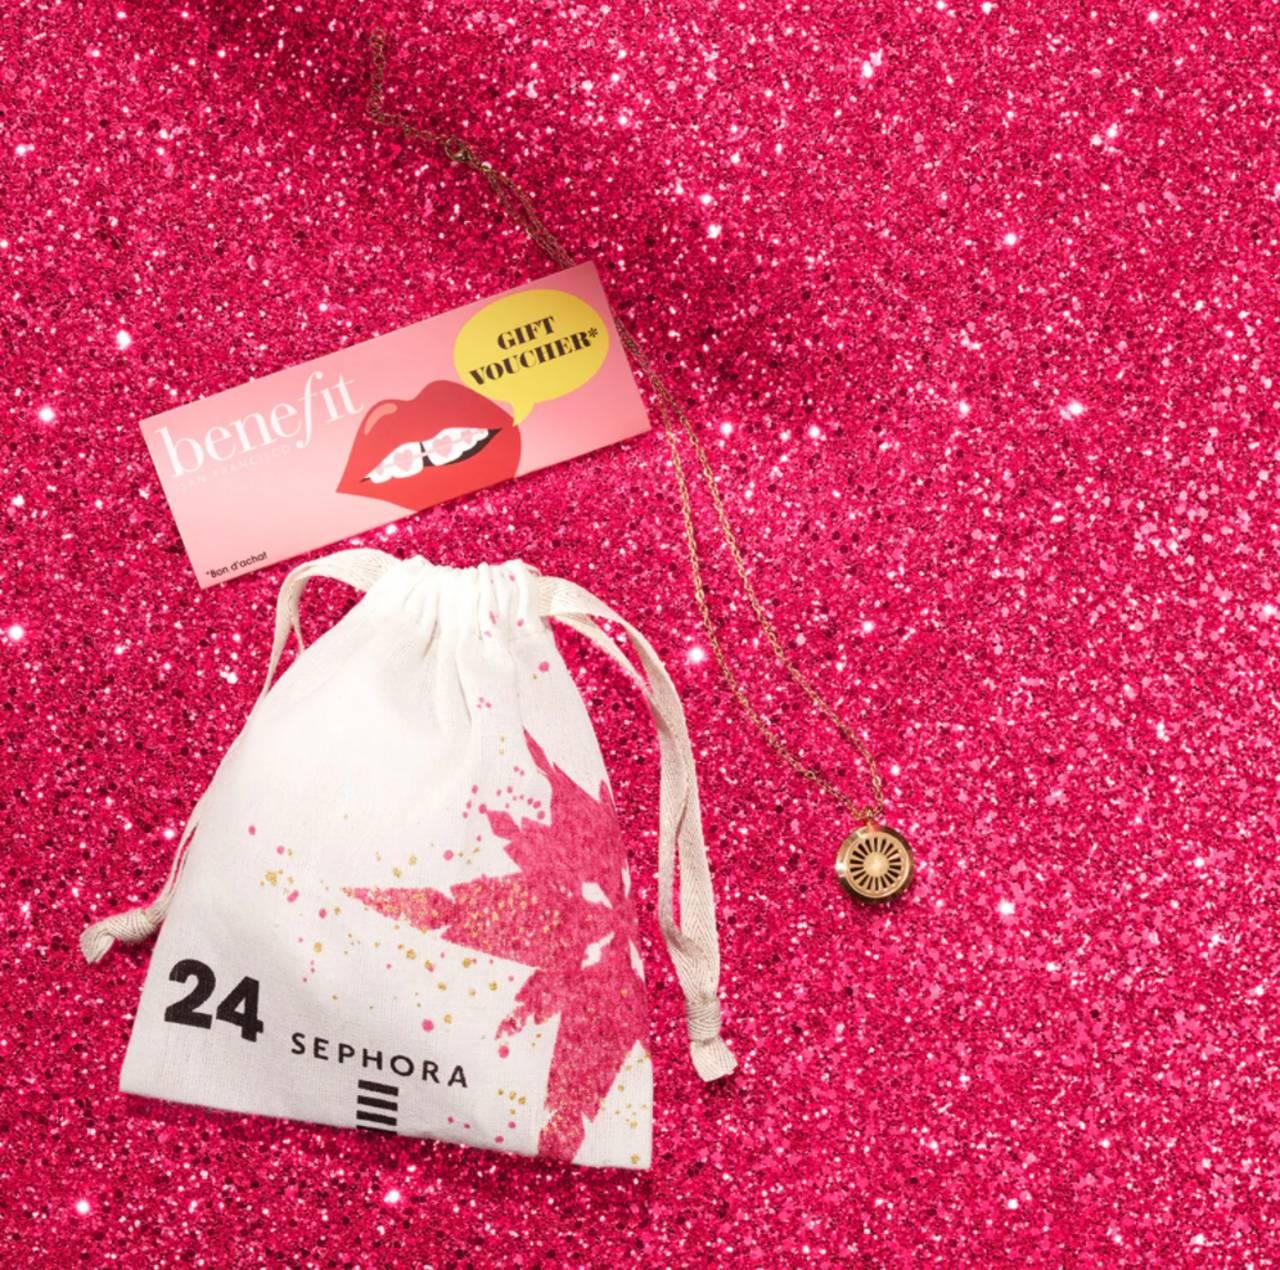 Sephora Favorites 2021 sorpresa regalo